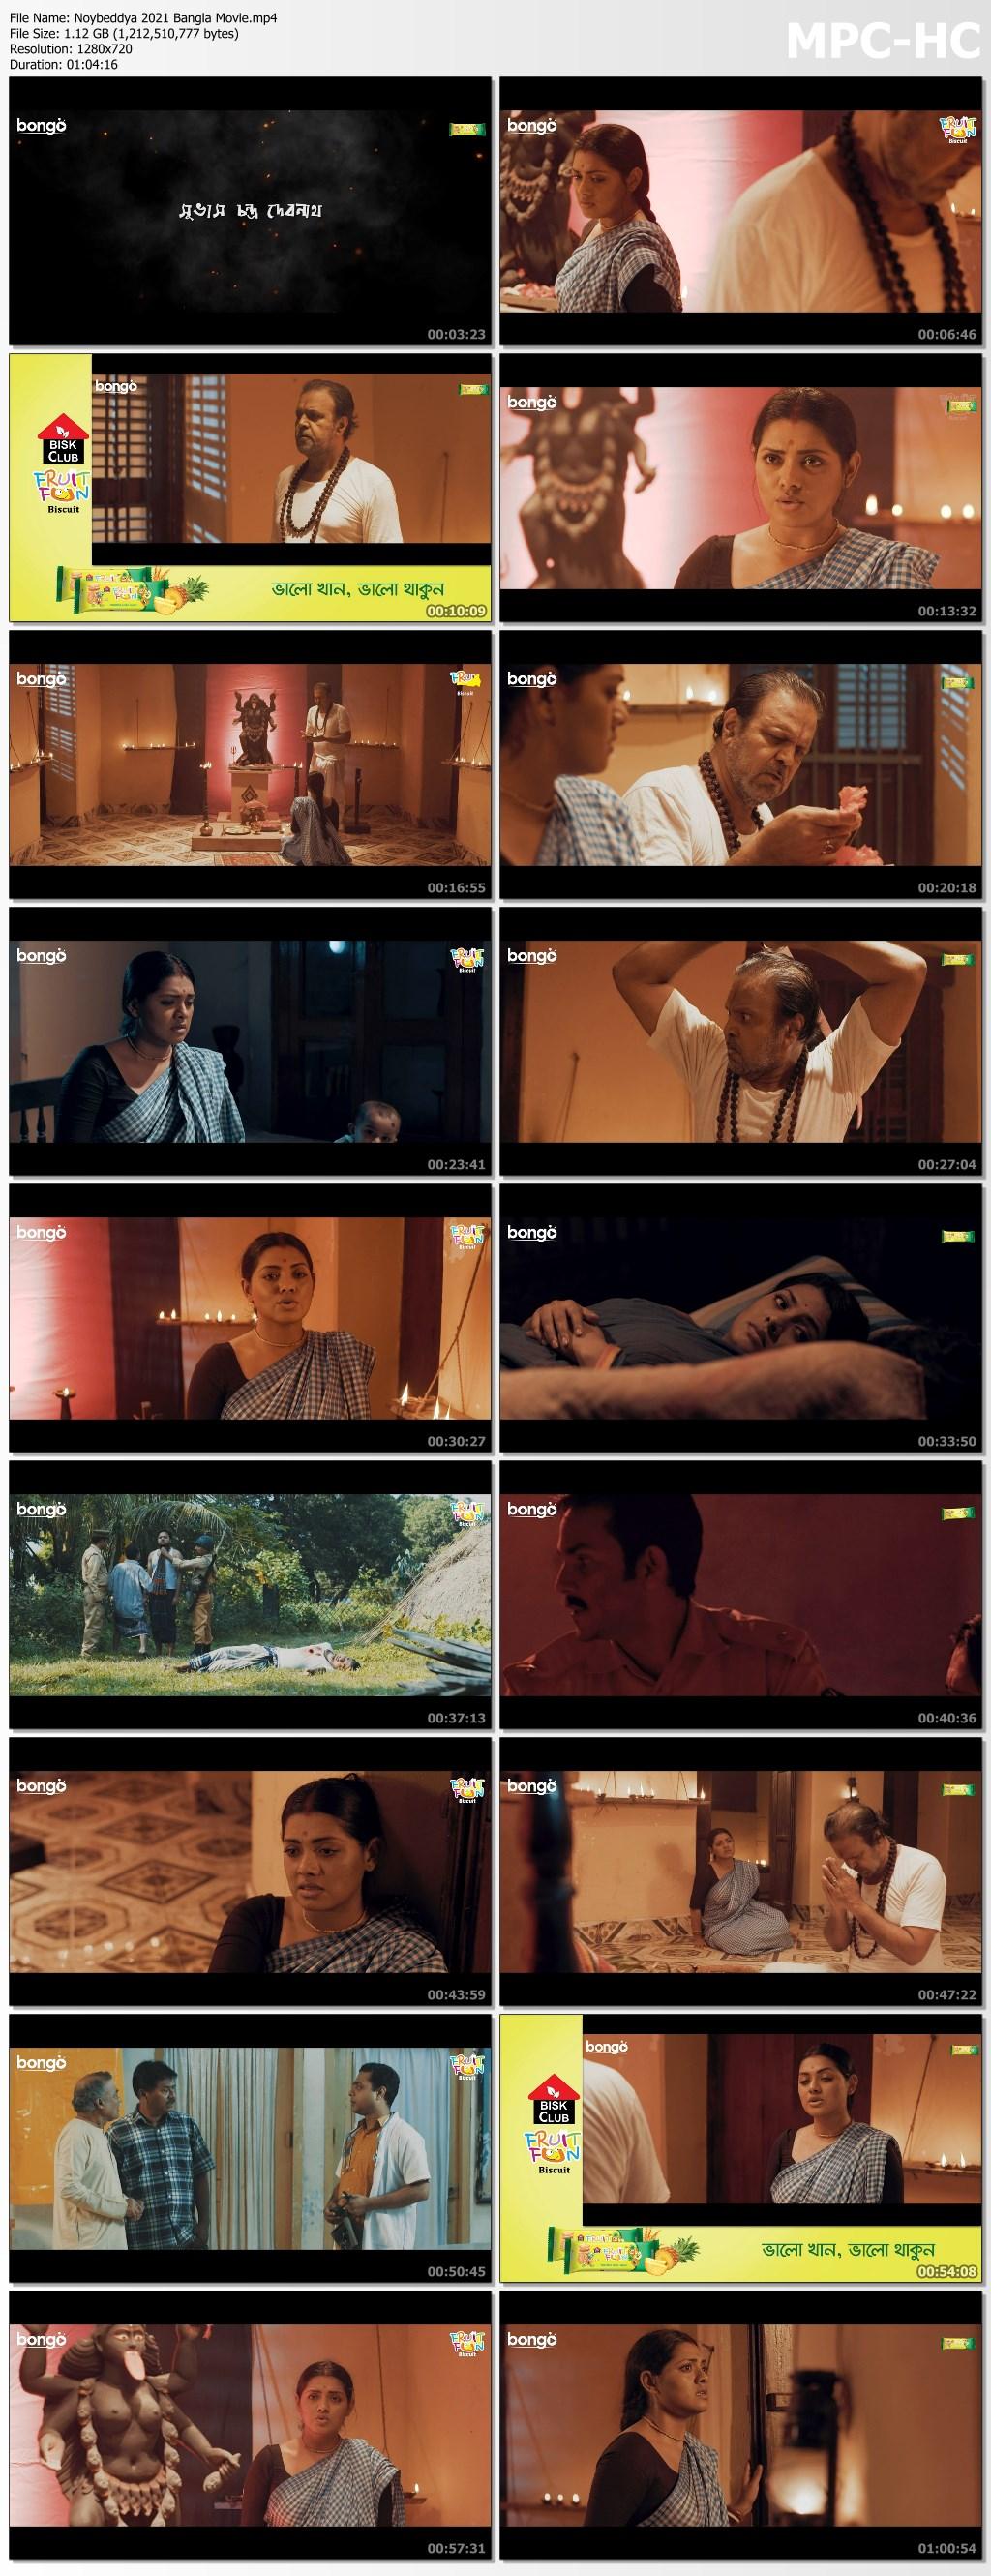 Noybeddya 2021 Bangla Movie.mp4 thumbs